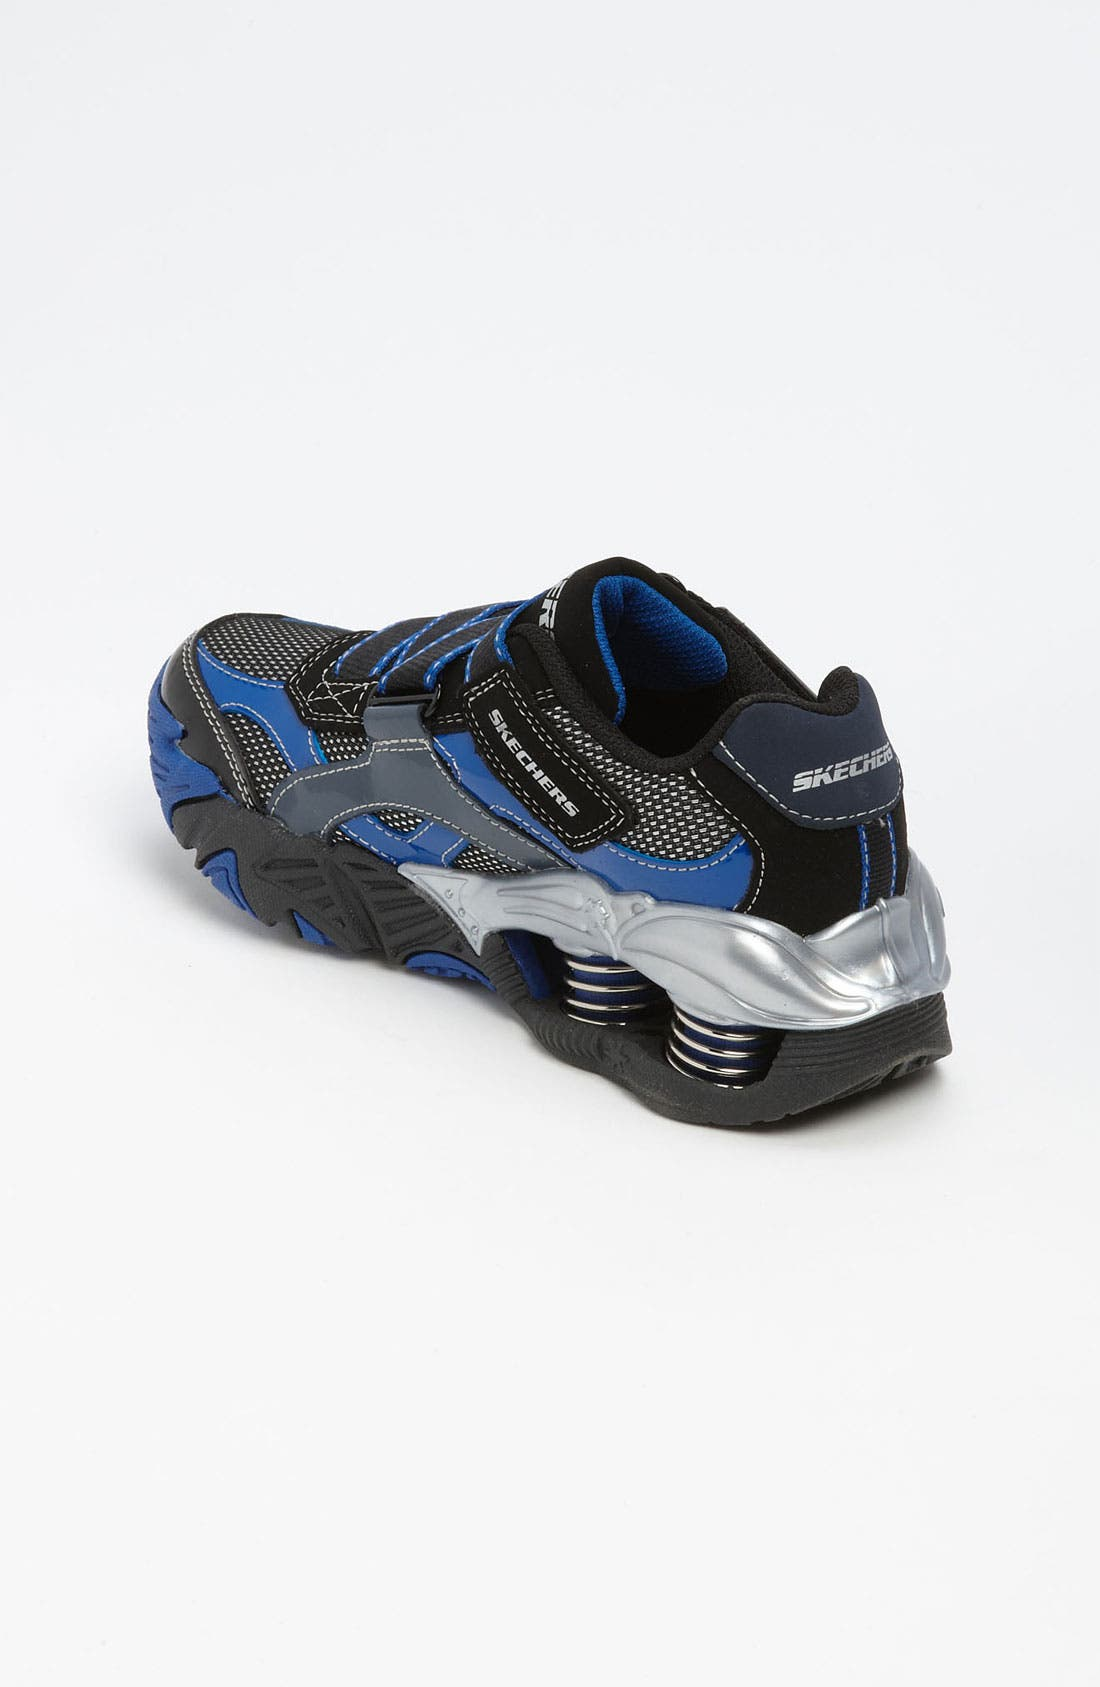 Alternate Image 2  - SKECHERS 'Pistonz' Sneaker (Toddler, Little Kid & Big Kid)